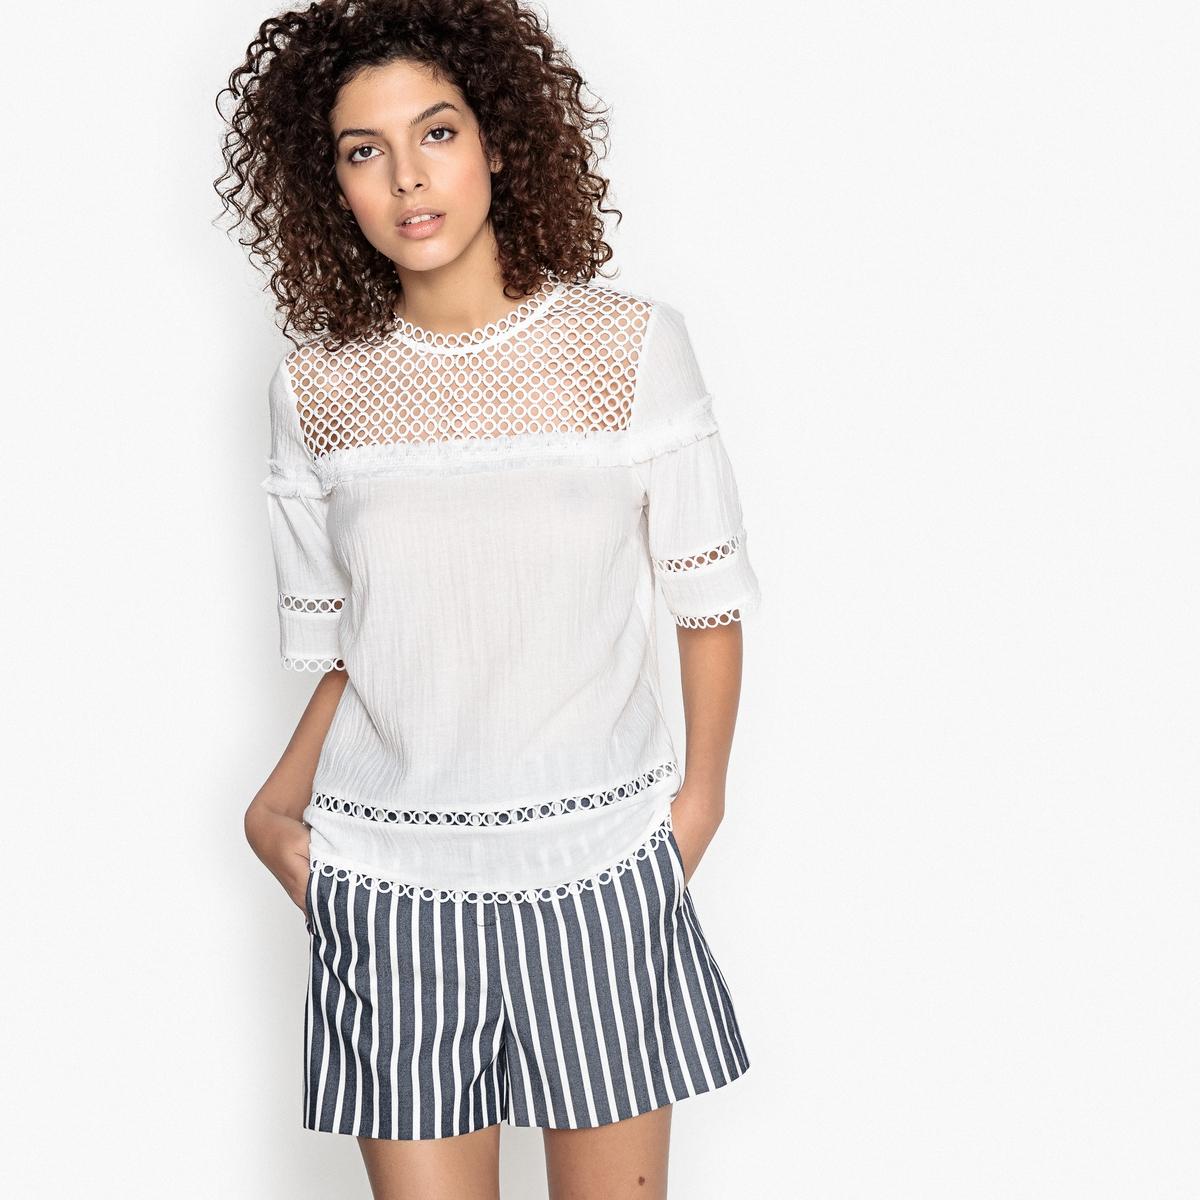 Блузка кружевная с короткими рукавами